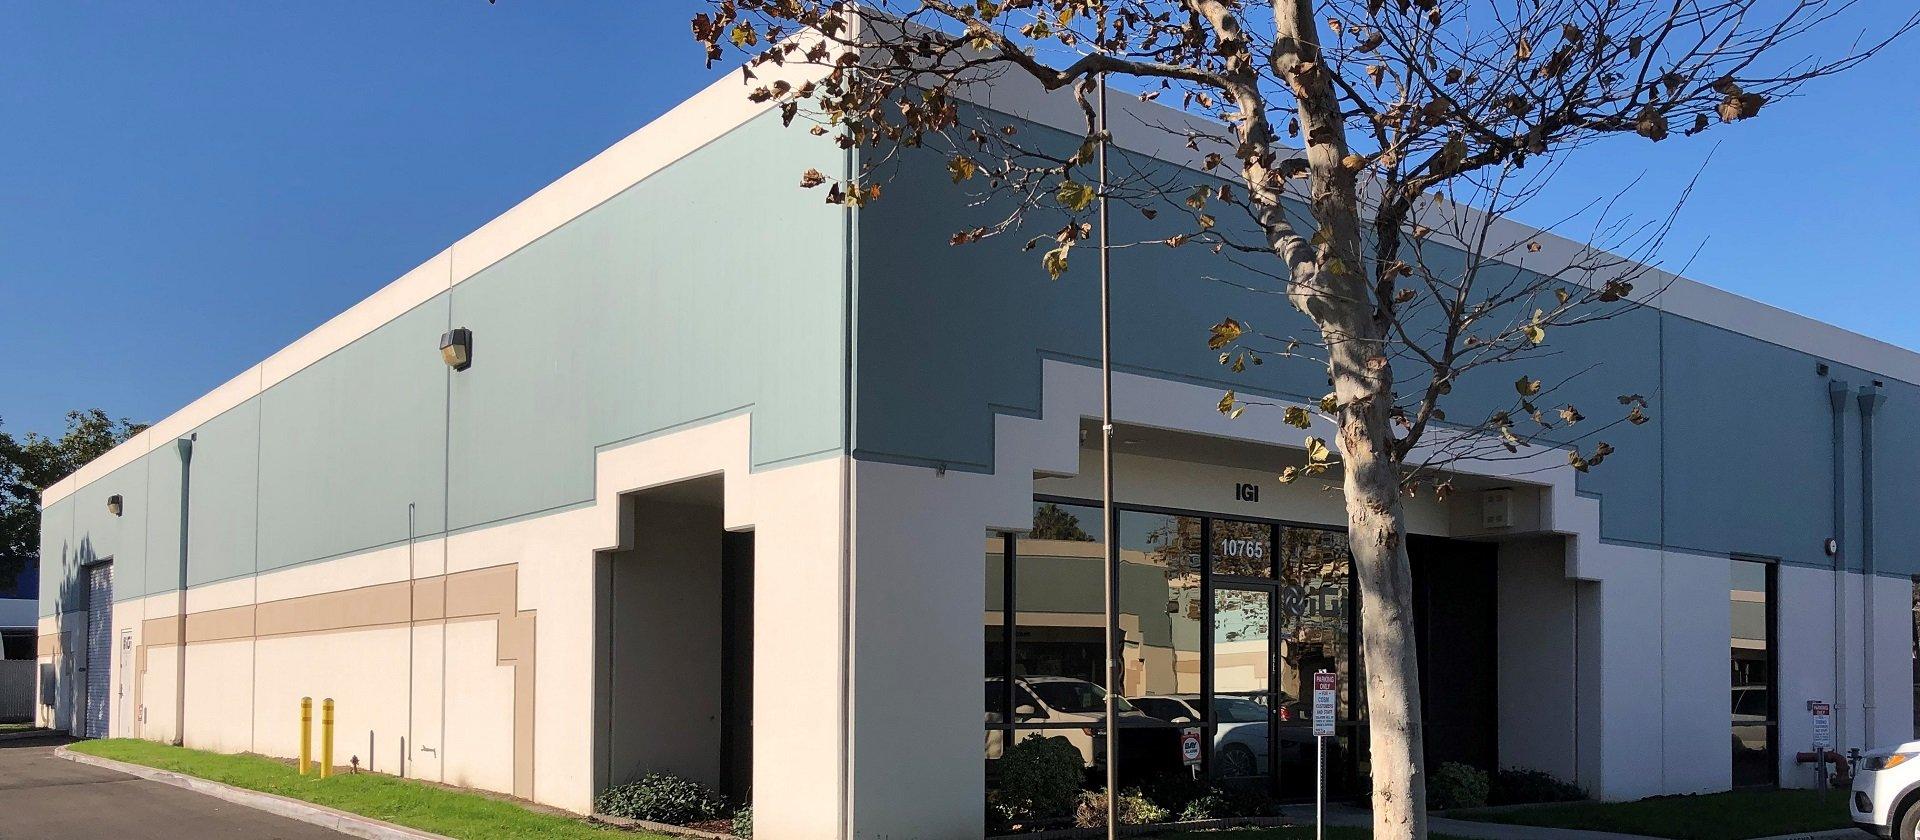 New IGI 7000 sq ft Facility in Los Alamitos CA